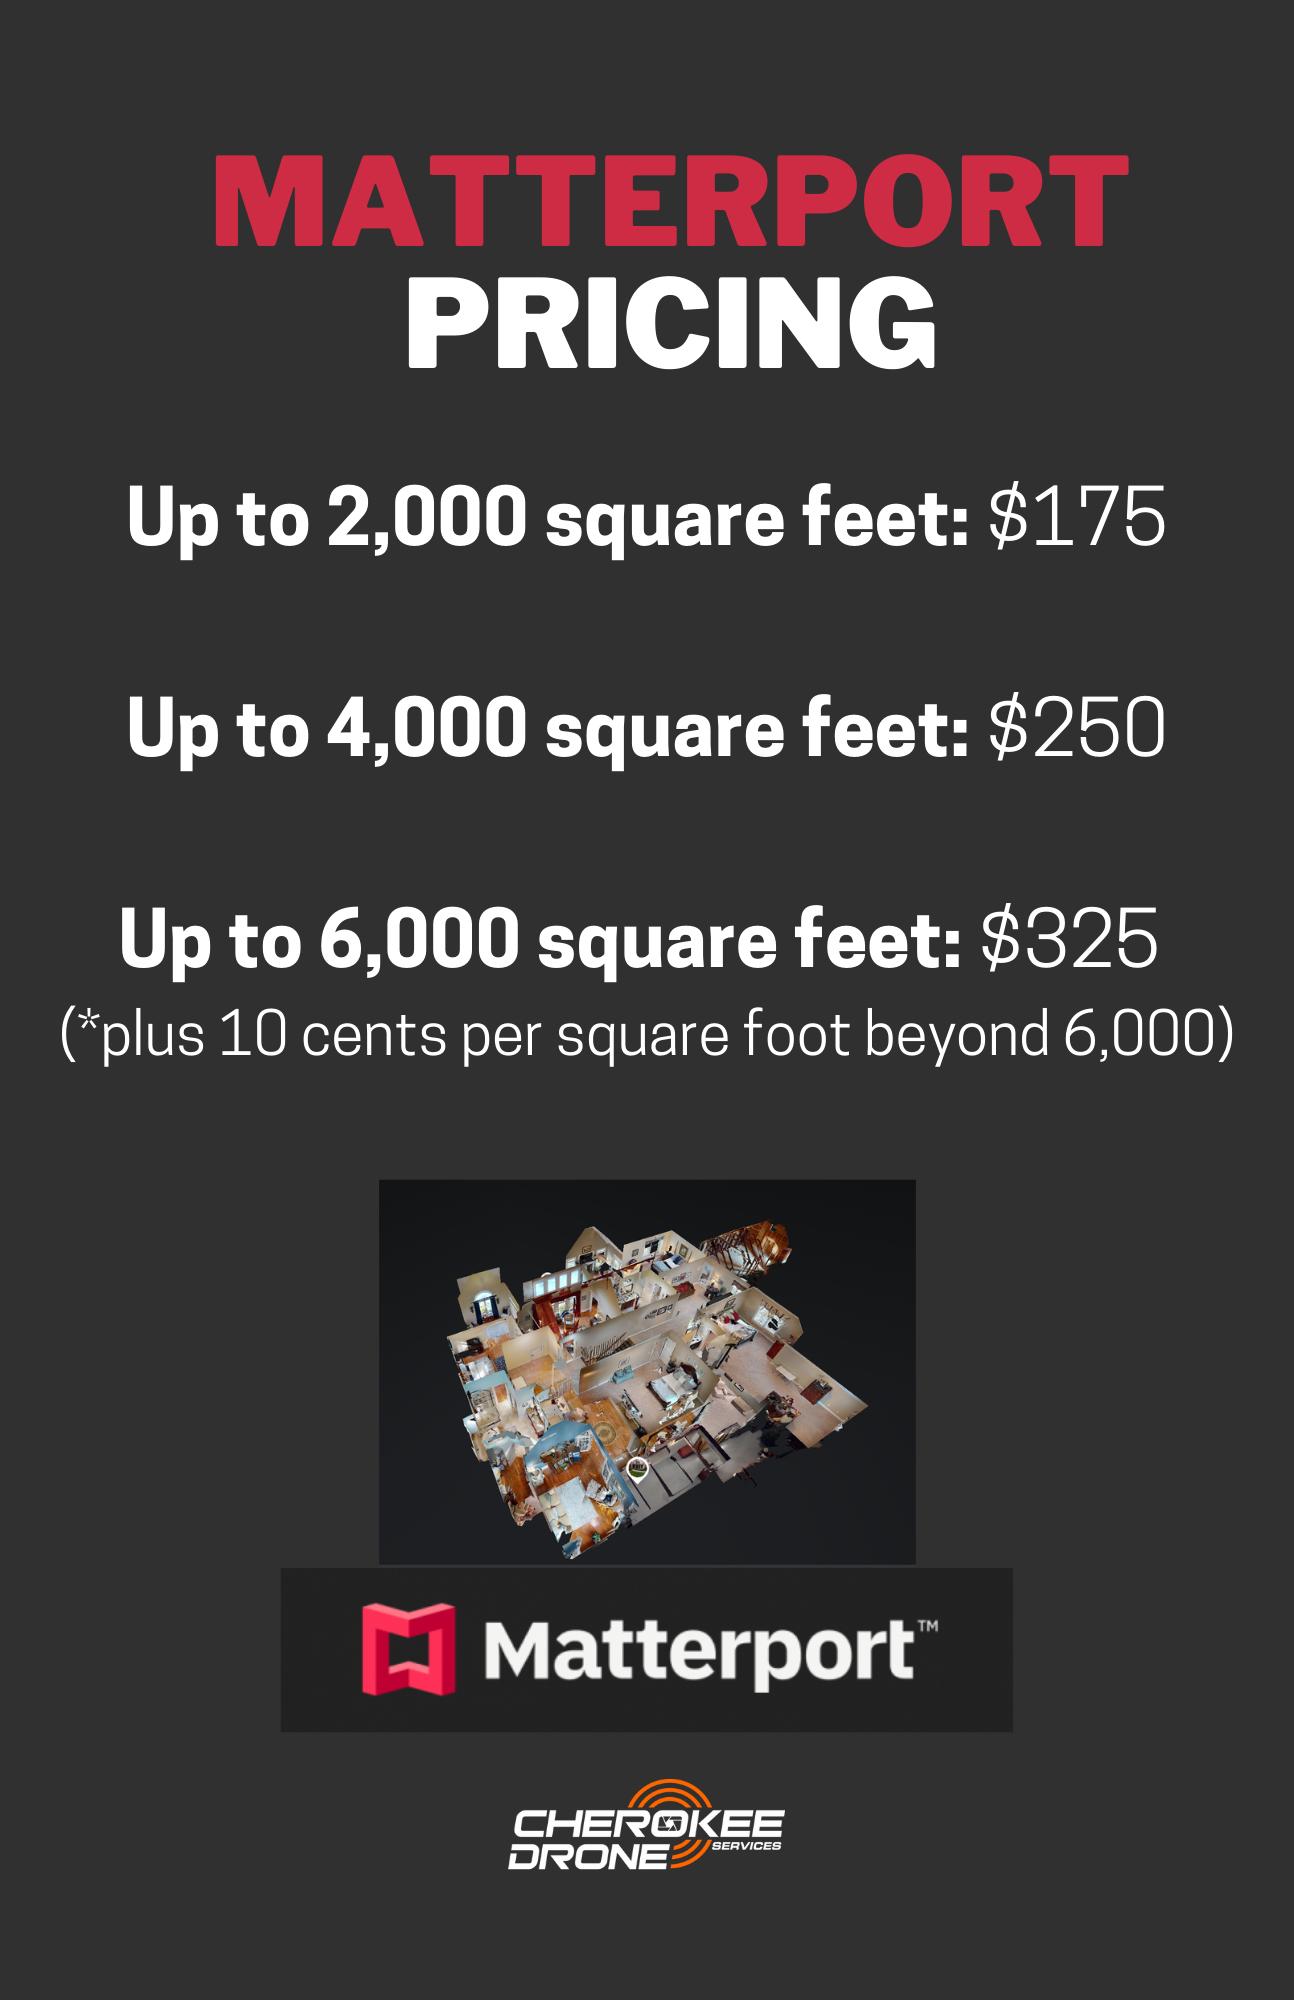 MATTERPORT PRICING